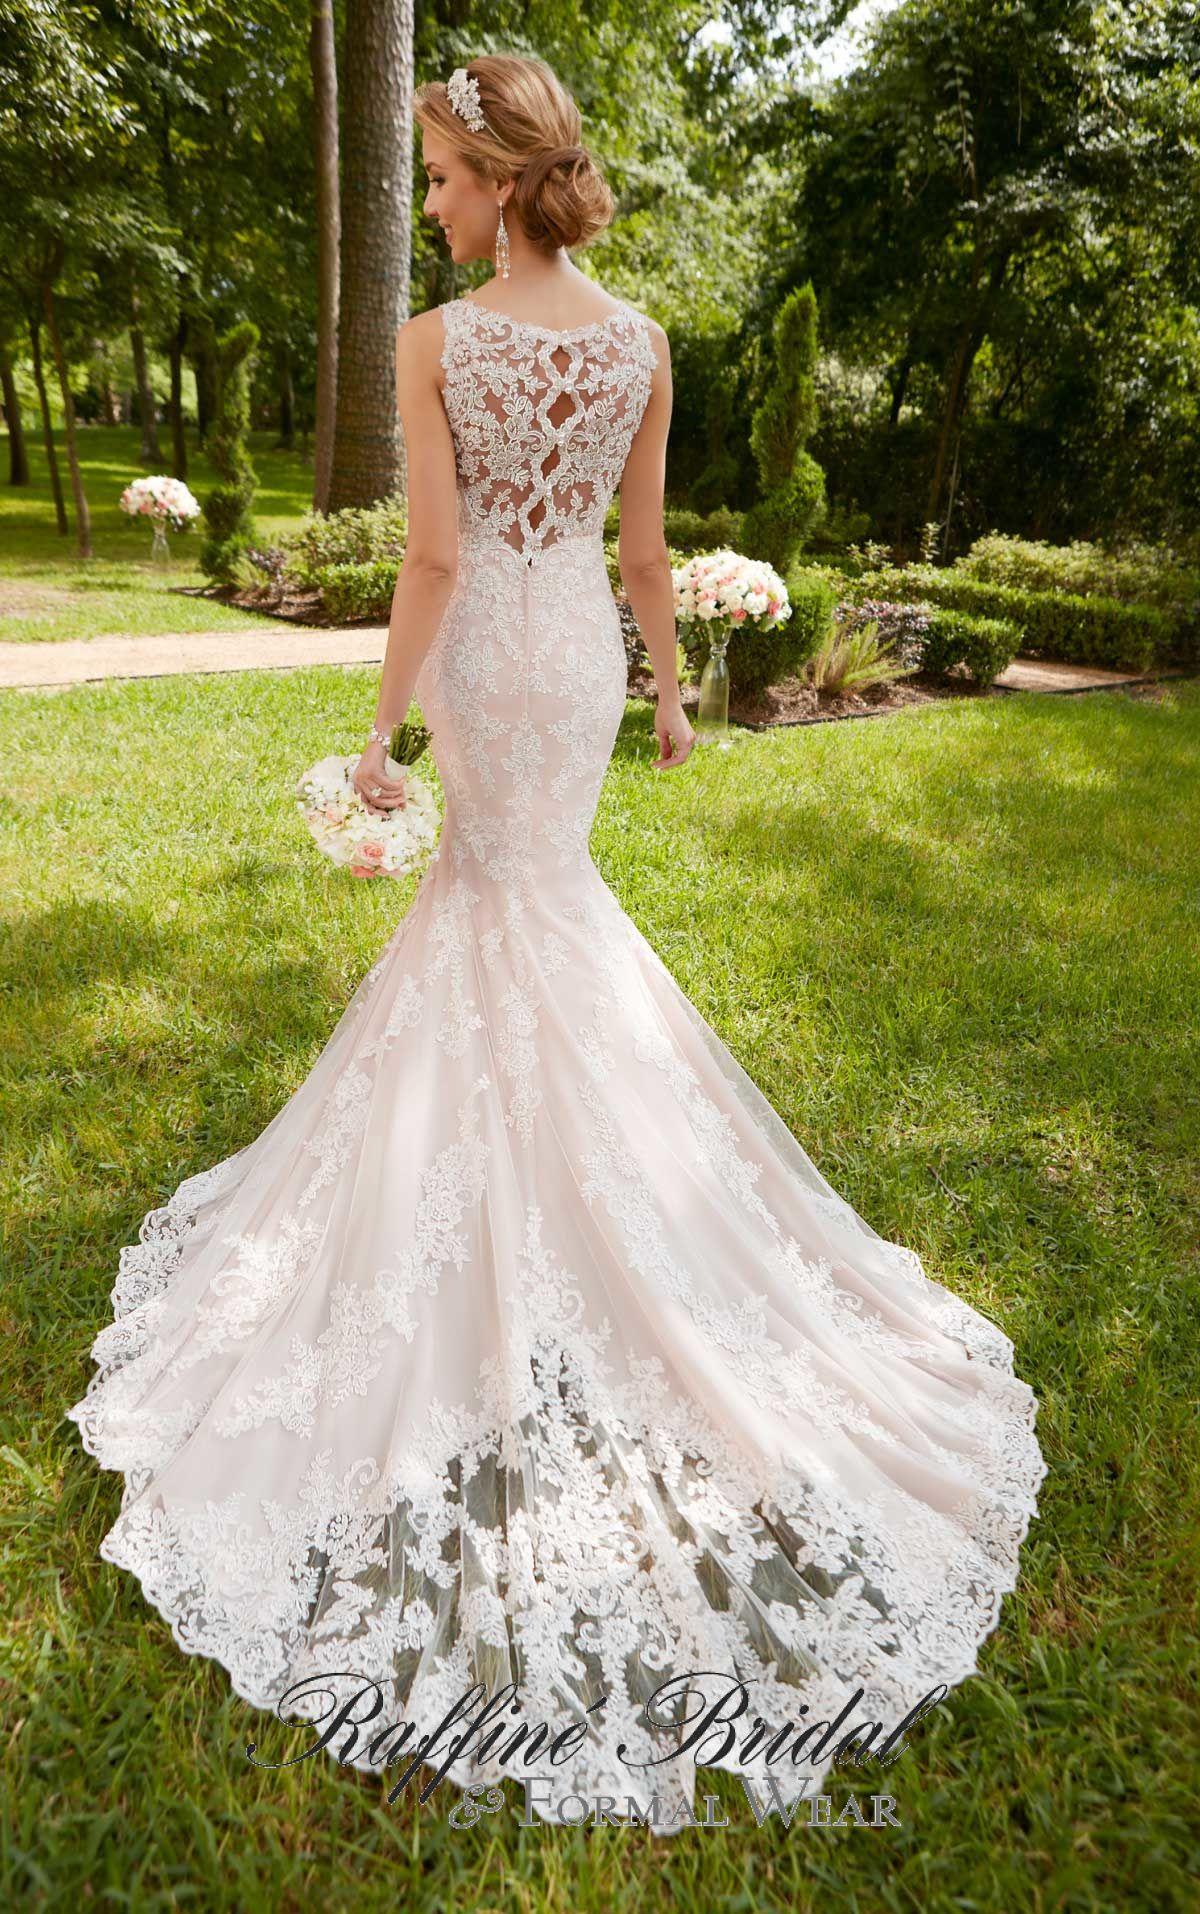 62a1c336c31 Stella York  6343 - This scalloped lace keyhole back wedding dress by Stella  York brings the drama